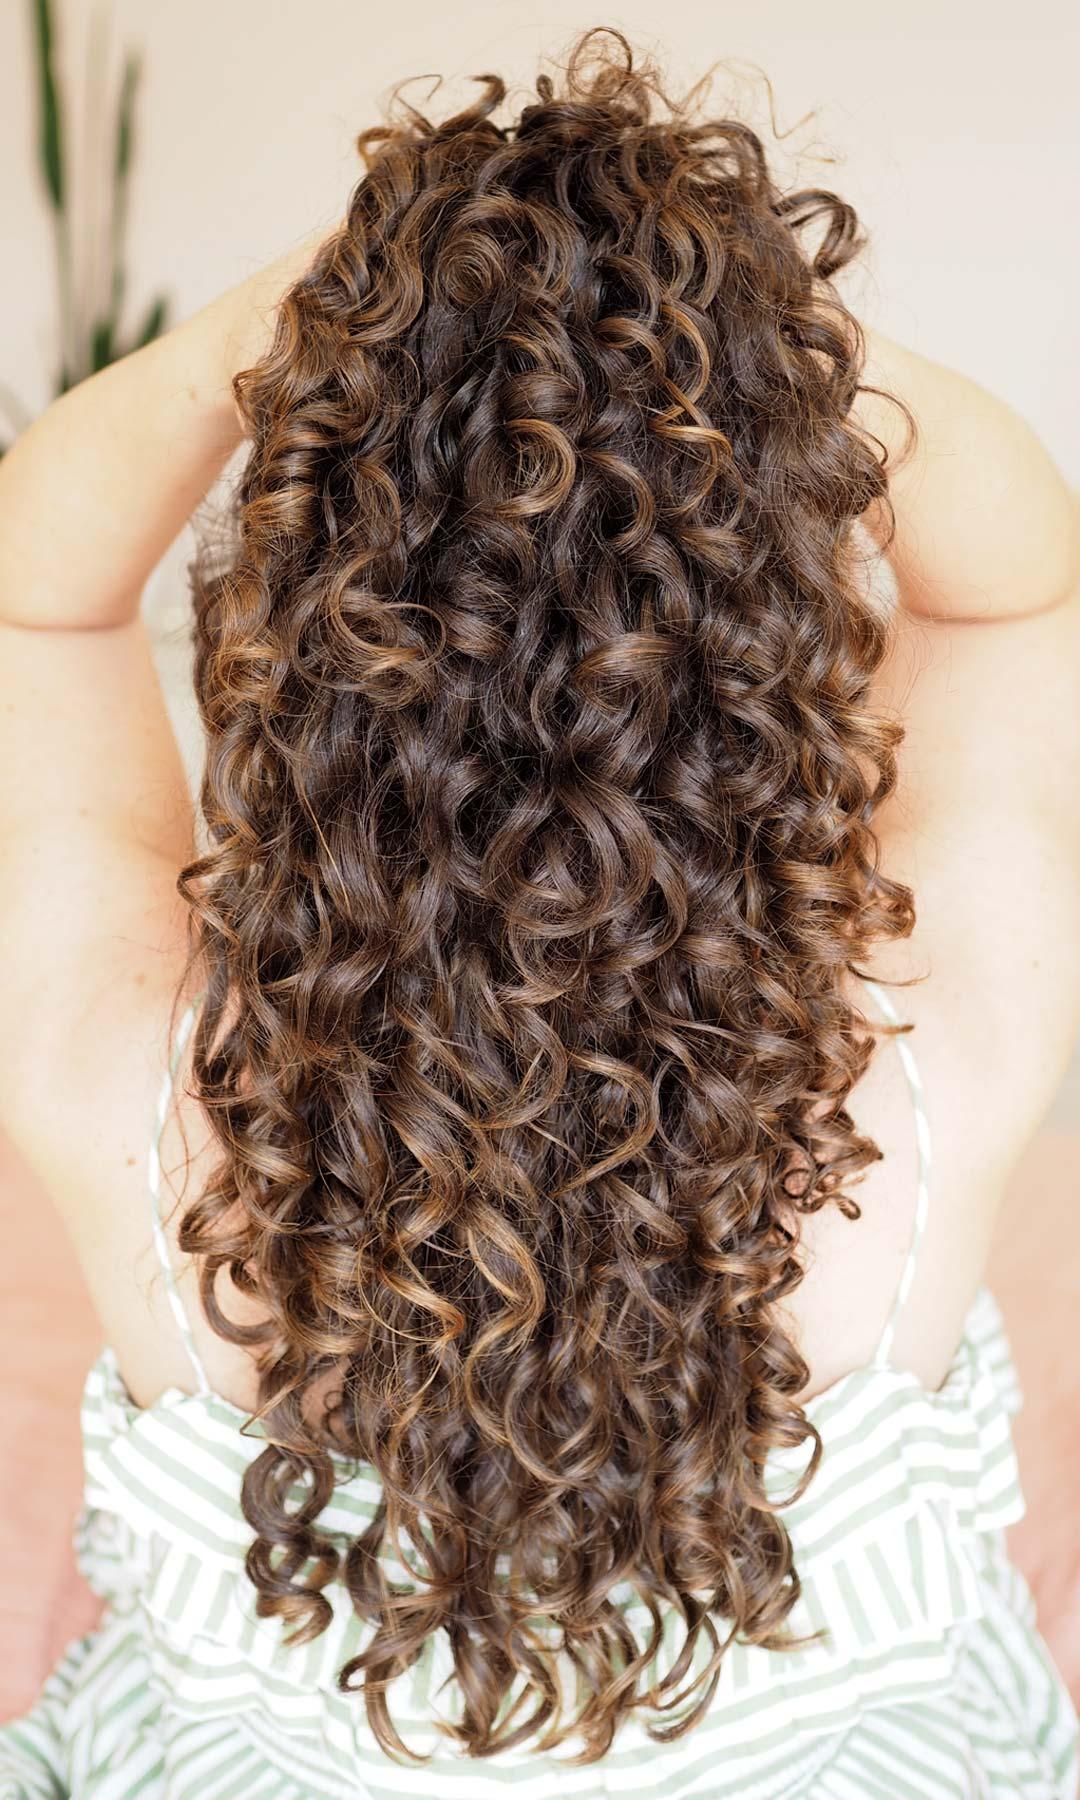 type 3 long curly hair